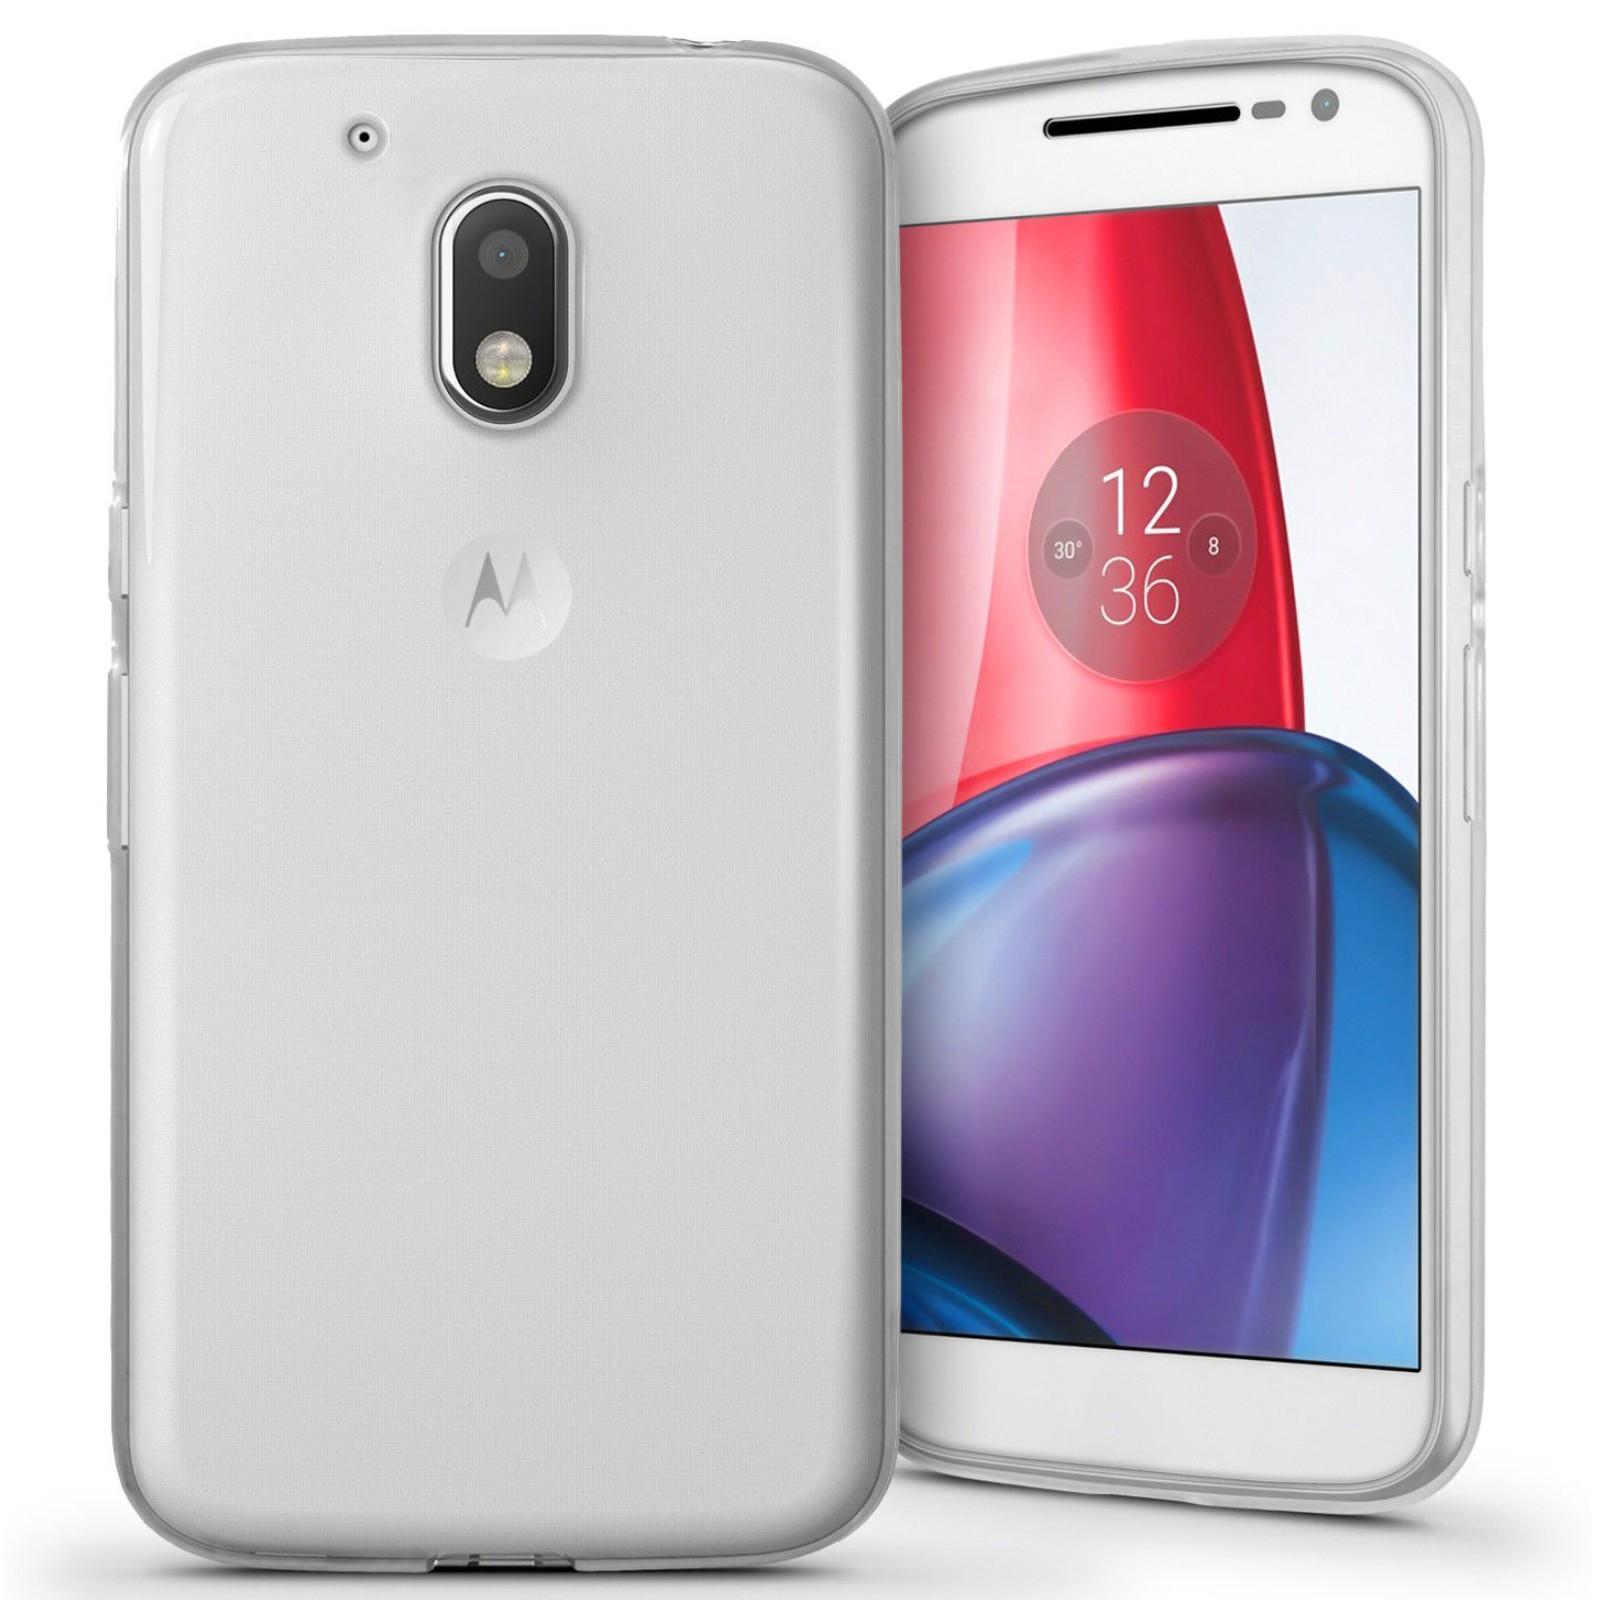 Funda de gel TPU carcasa protectora silicona para movil Motorola Moto G G2 G3 G4 G5 G5S G7 Plus Play Power Elige Modelo